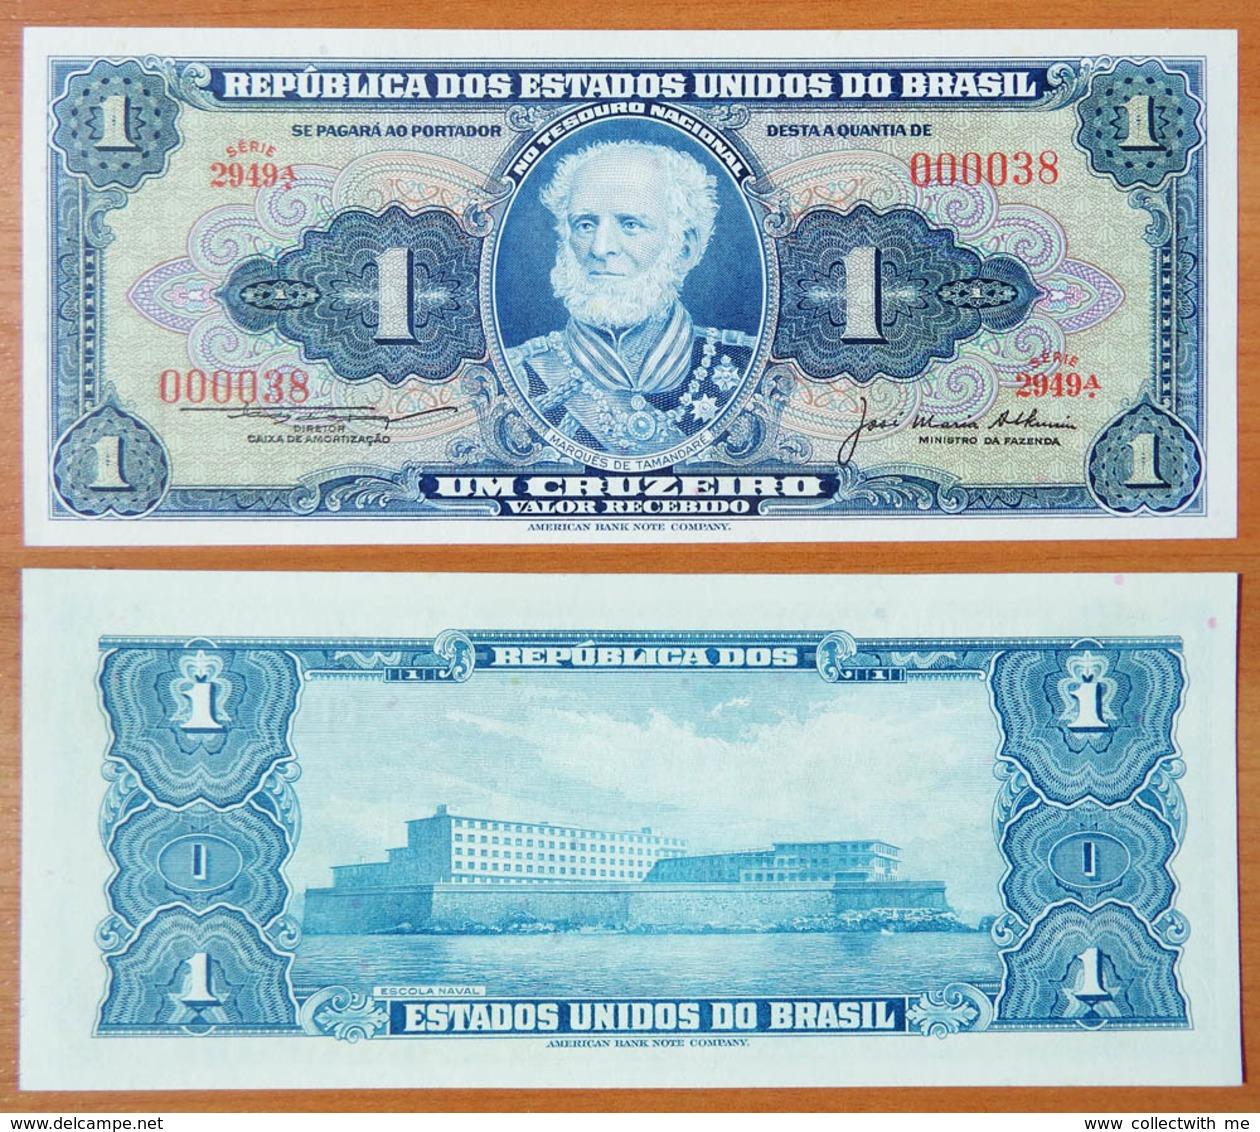 Brazil 1 Cruzeiro 1976 UNC S/n 000038 - Brésil